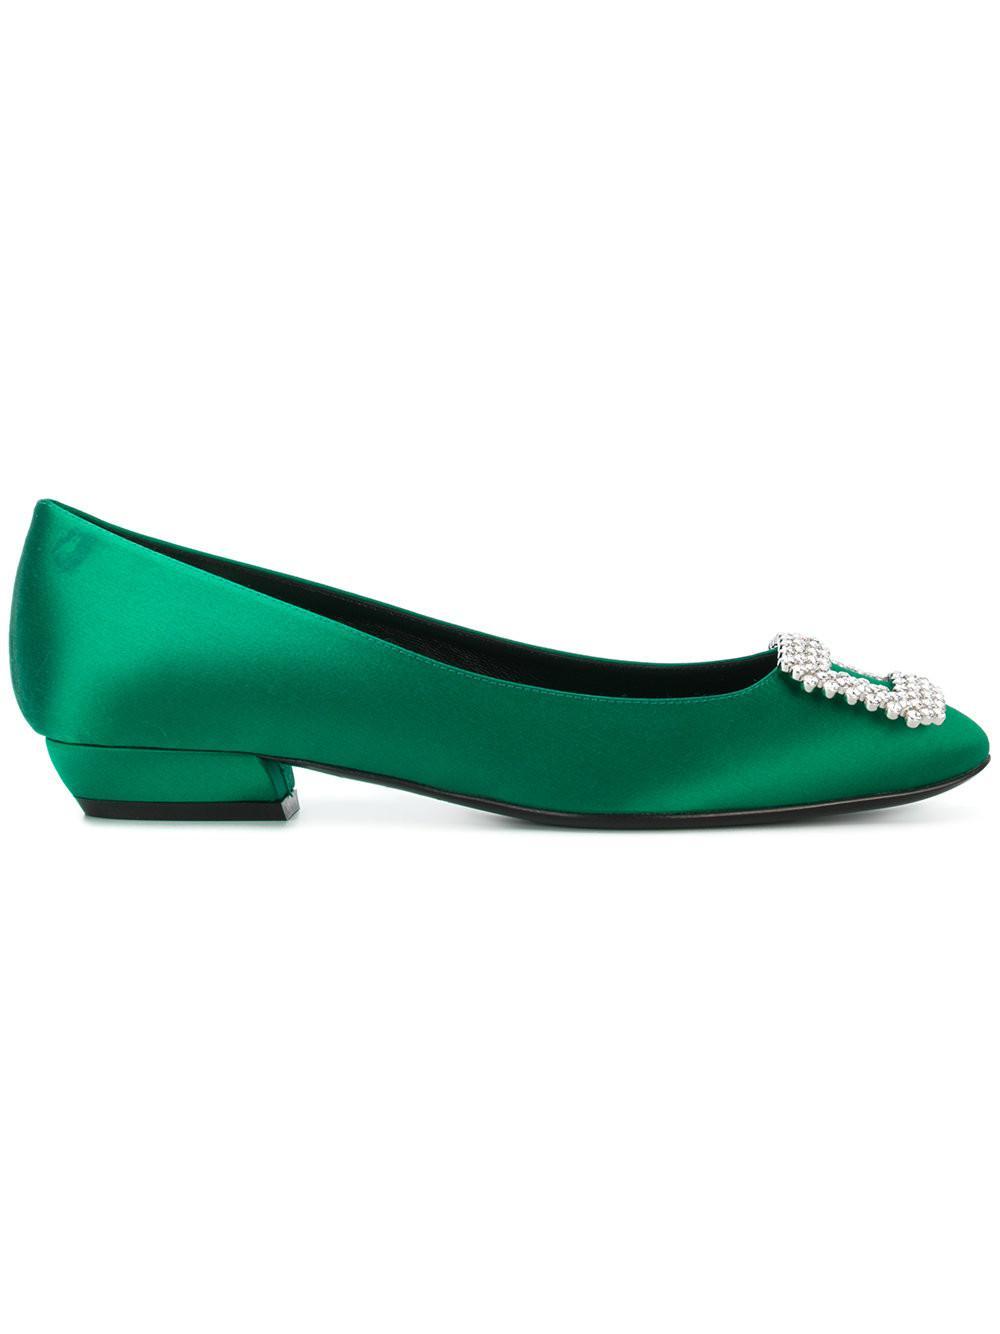 4c9130465 Lyst - Roger Vivier Embellished Buckle Ballerina Shoes in Green ...